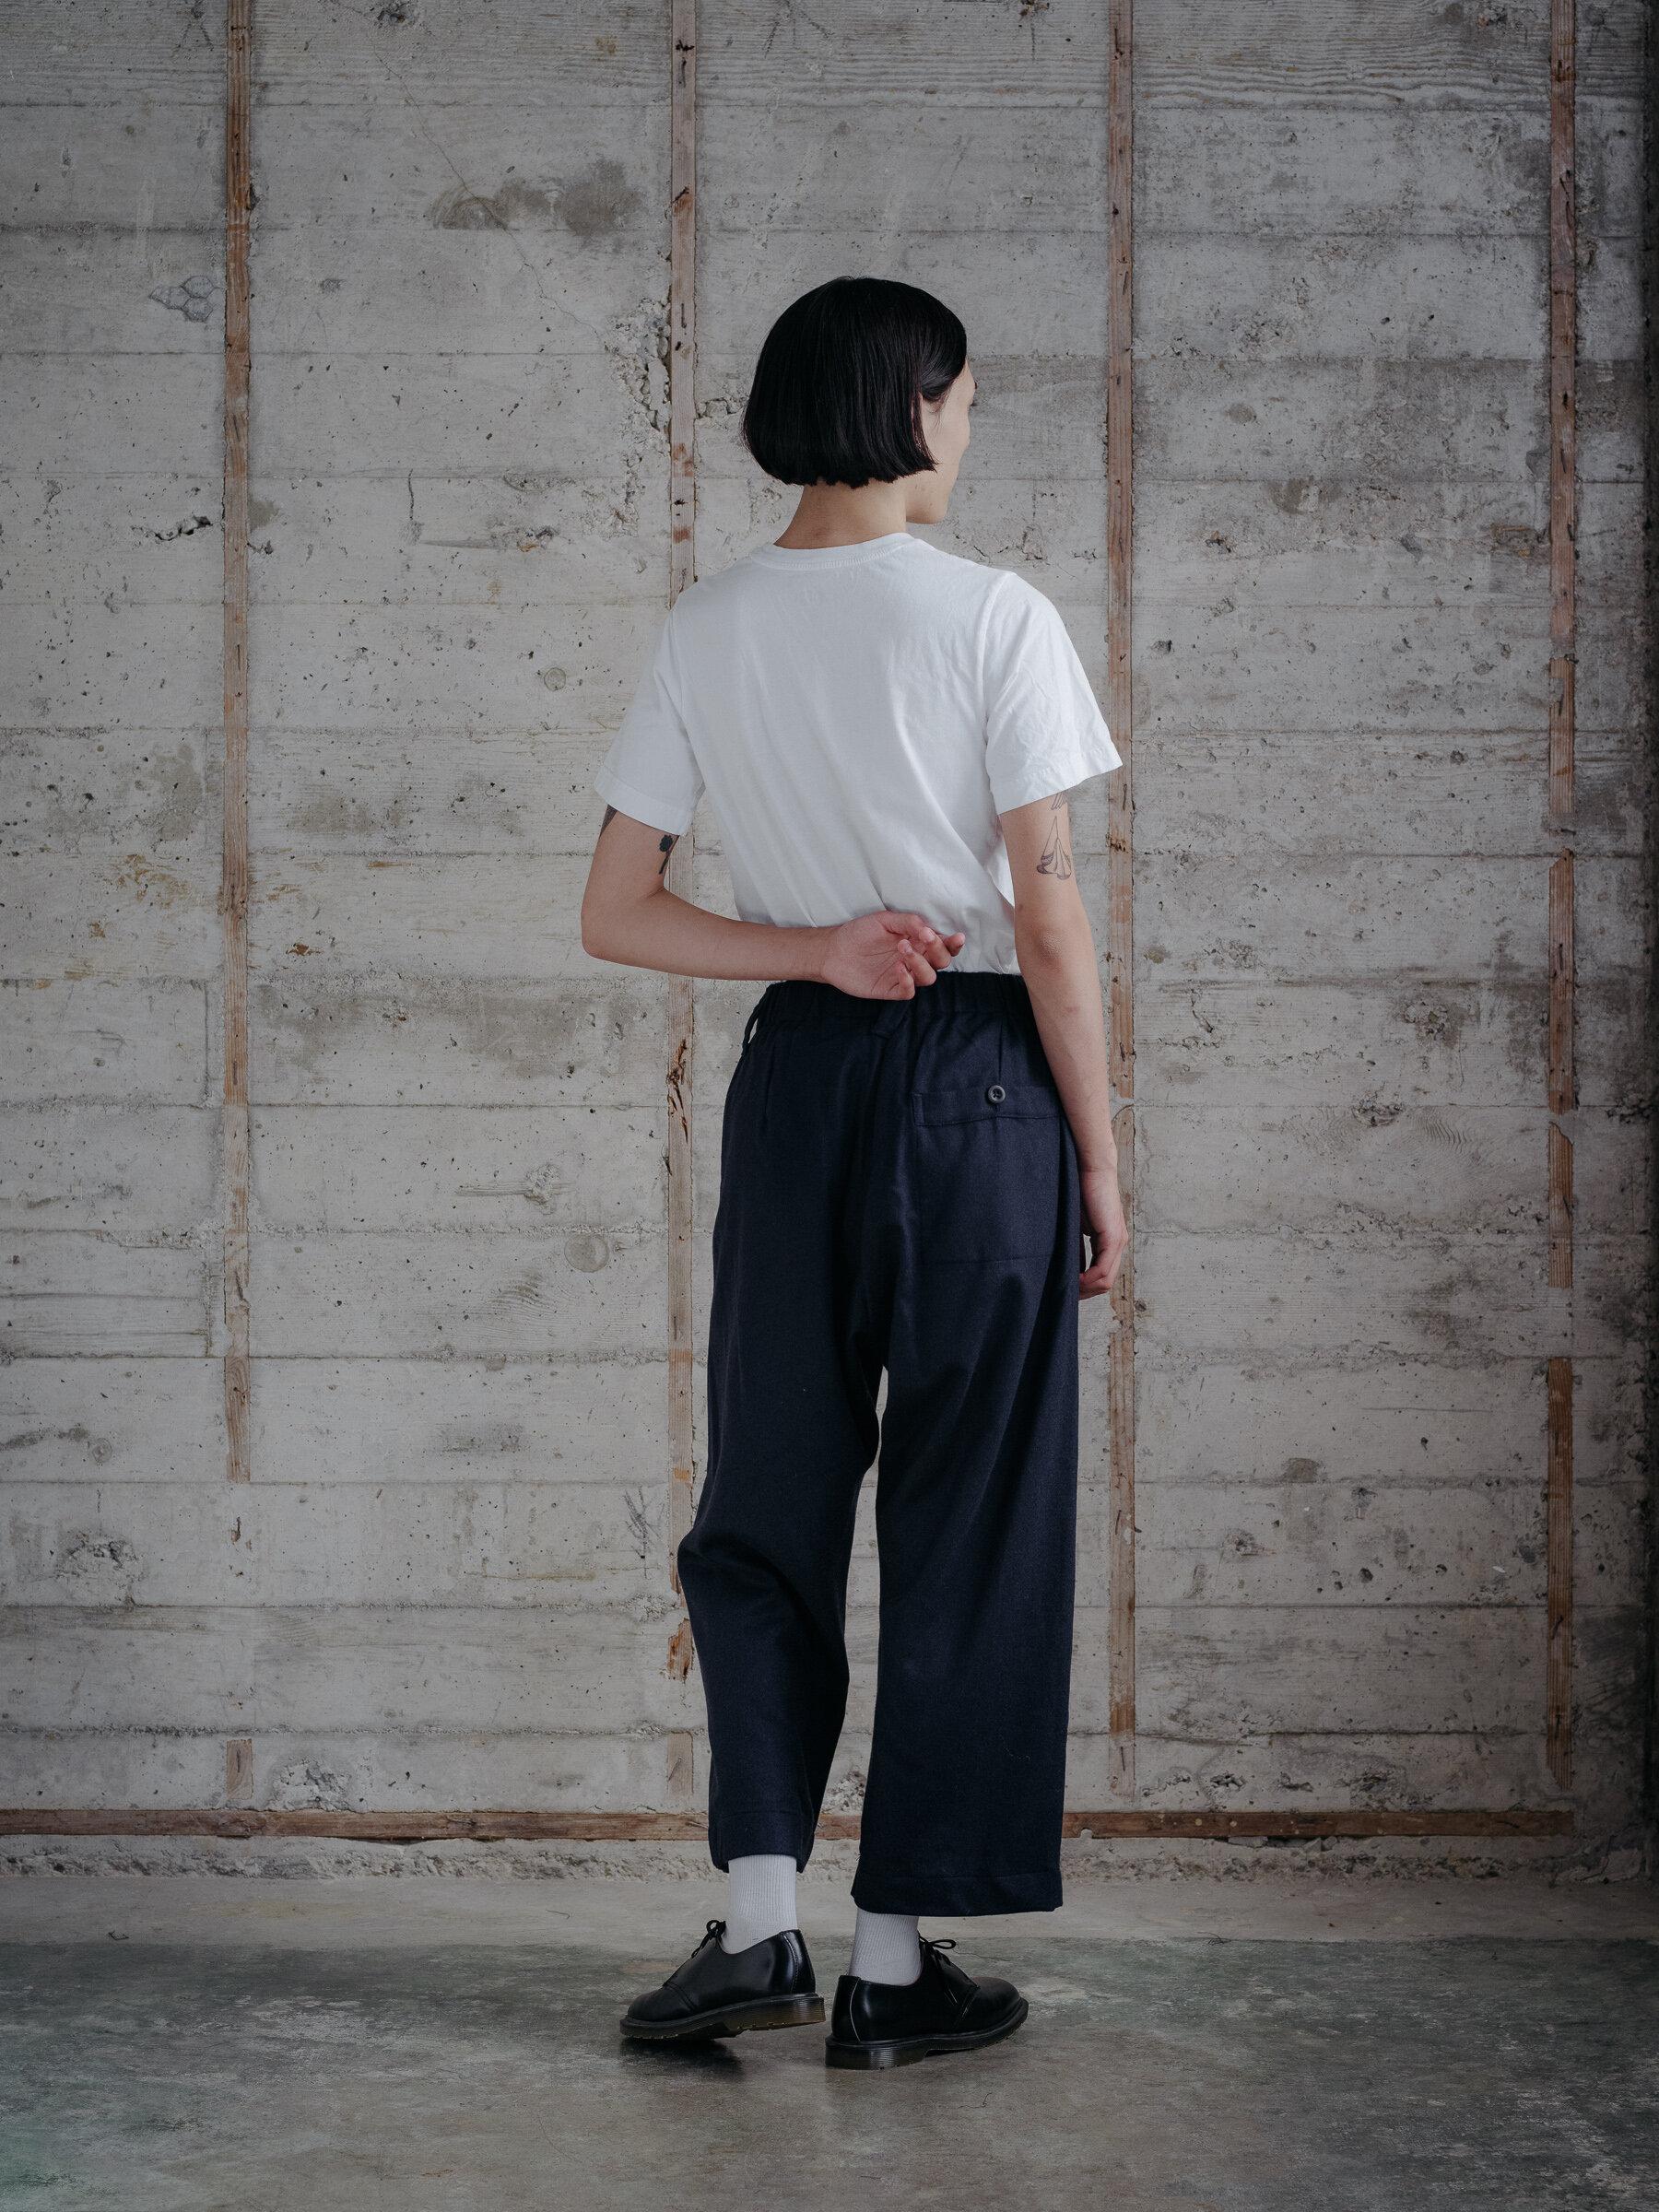 evan-kinori-elastic-pant-cashmere-lambswool-woven-in-england-made-in-san-francisco-11